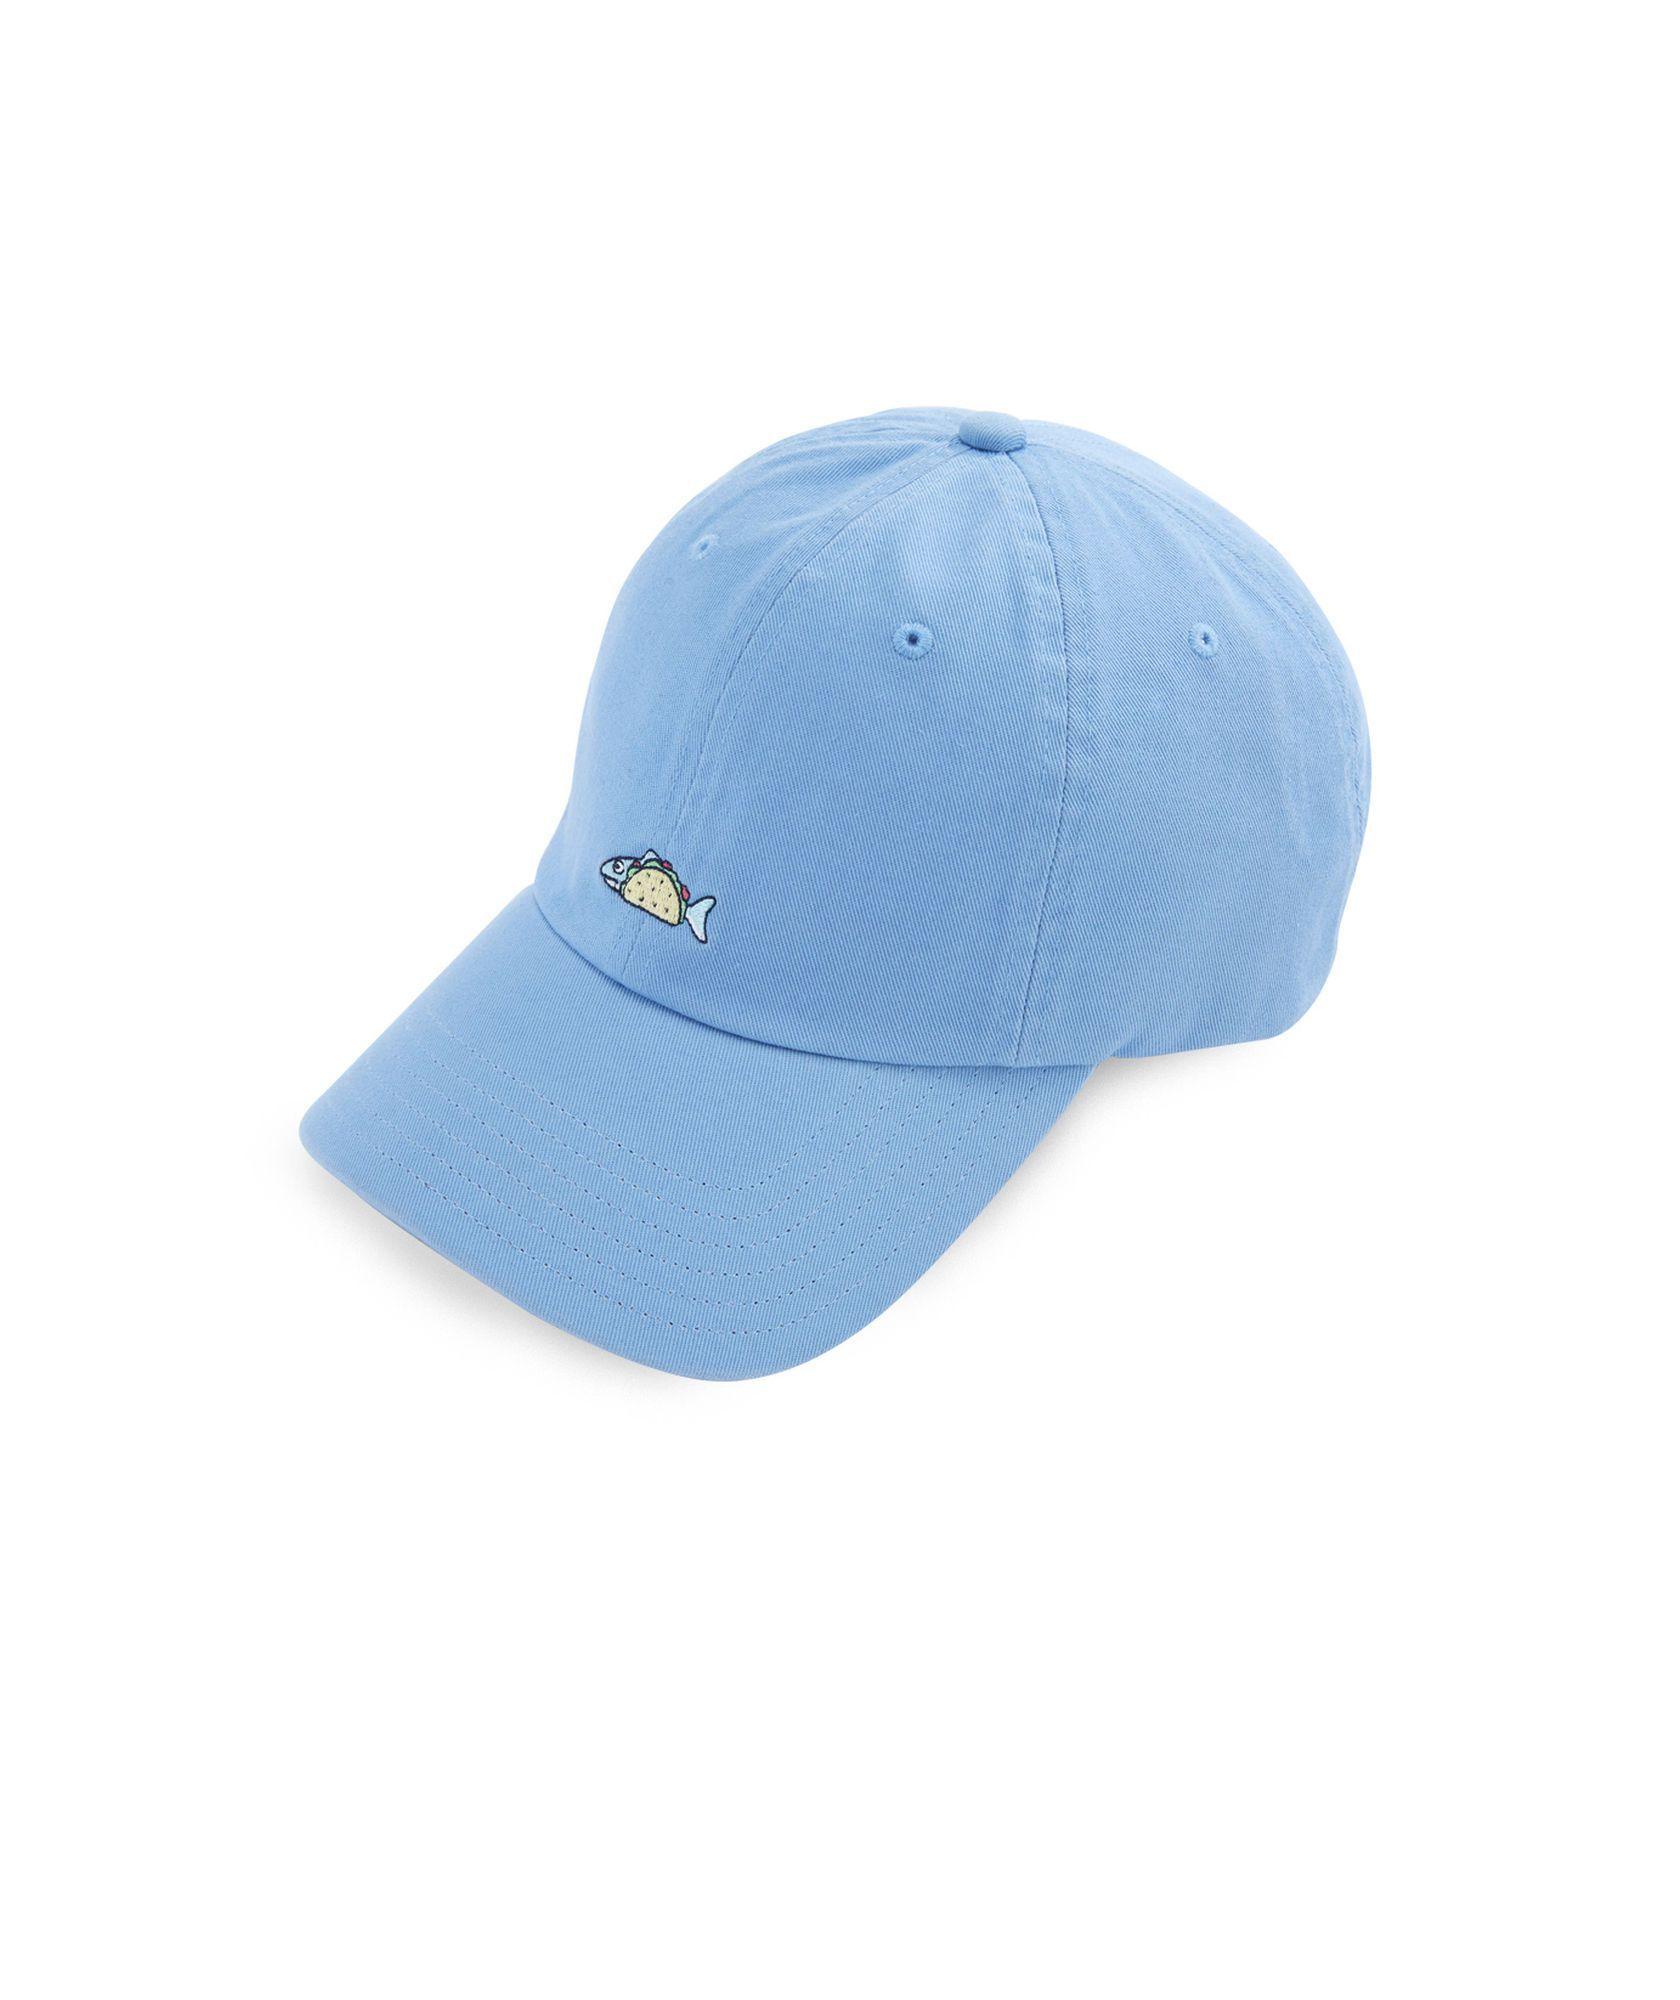 5f1ddae3505 Vineyard Vines Fish Taco Logo Baseball Hat - Ocean Breeze